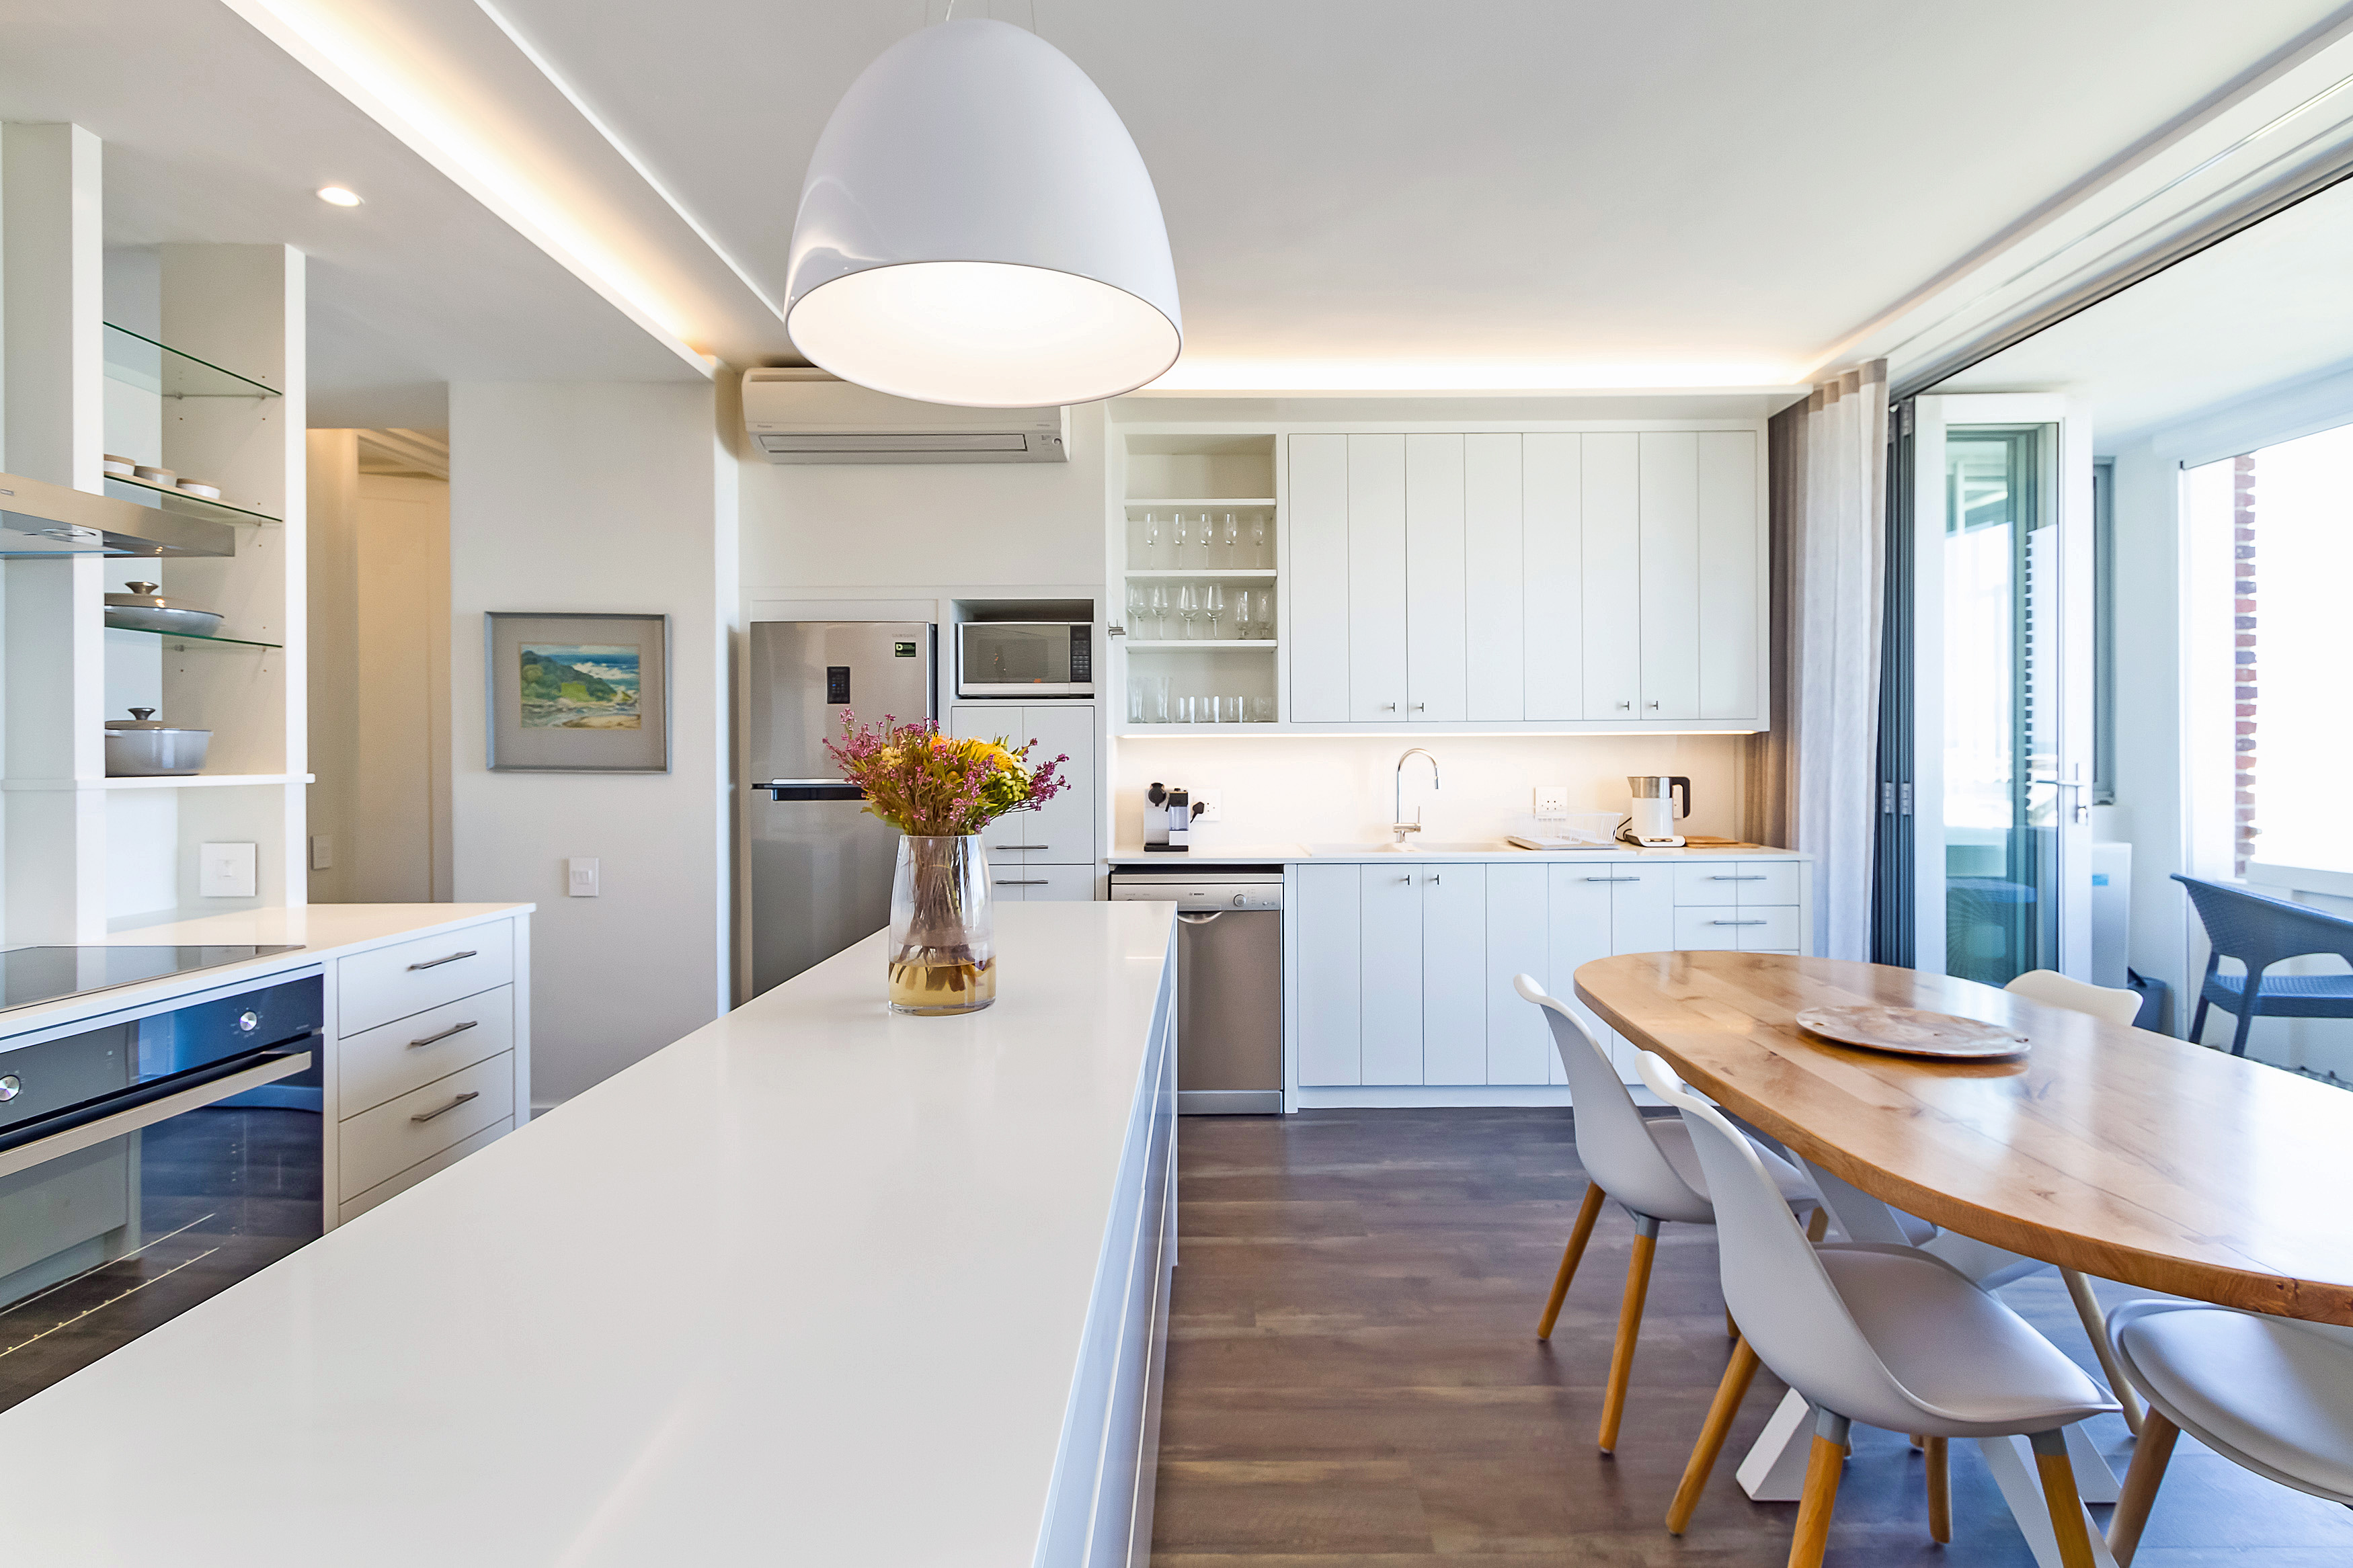 Sommerküche Auf Dem Balkon : Villa sommer true luxury villas